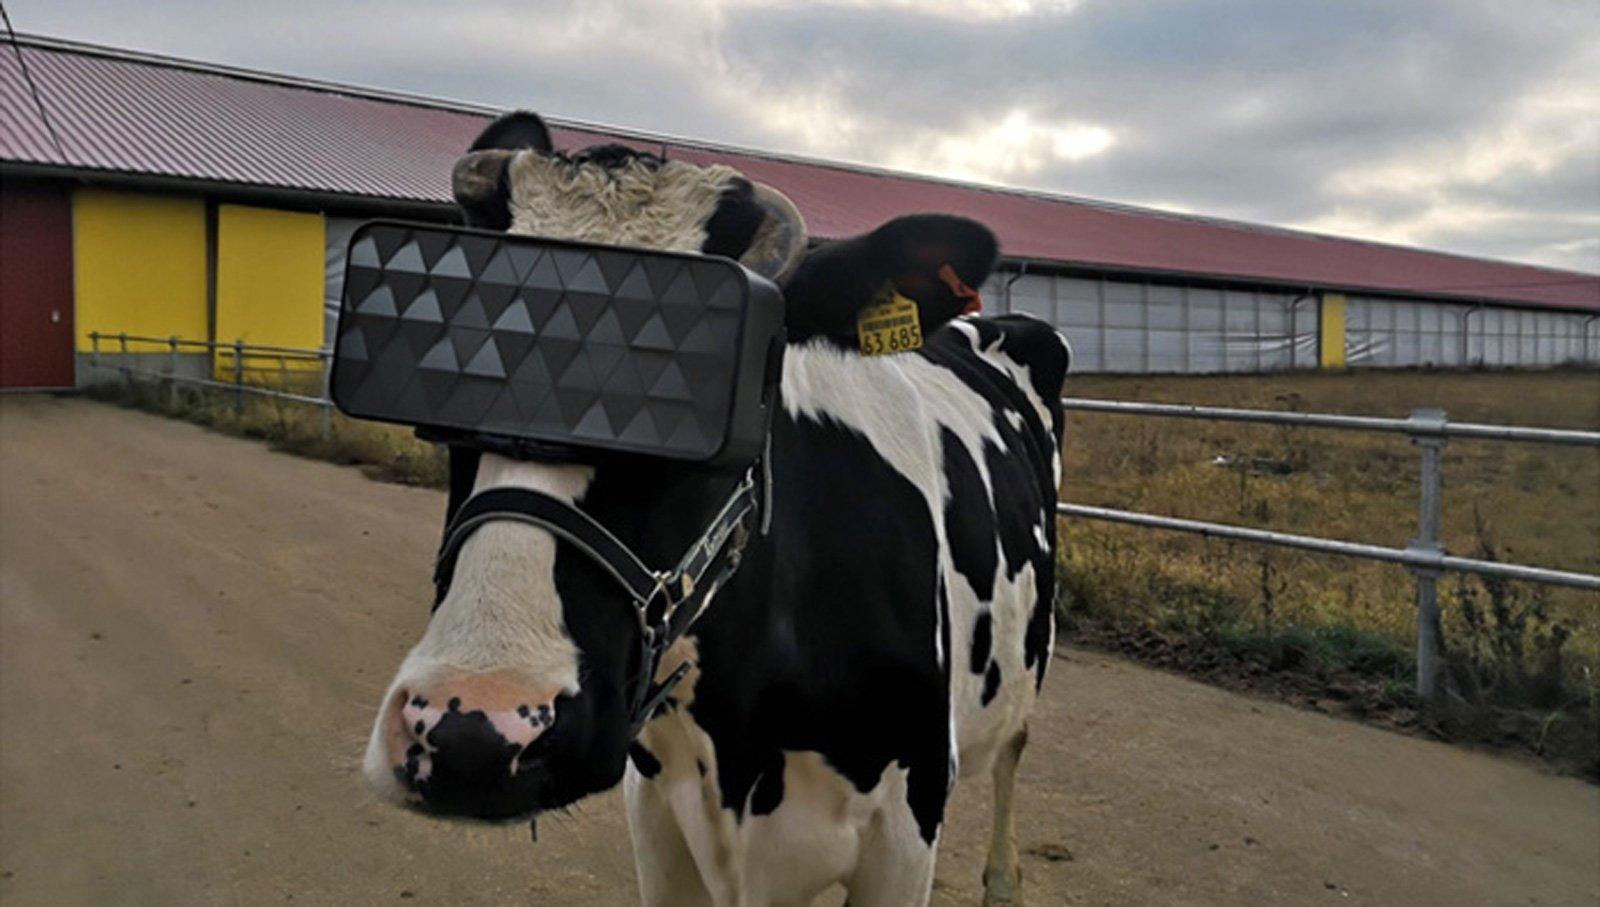 vacas realidade virtual russia